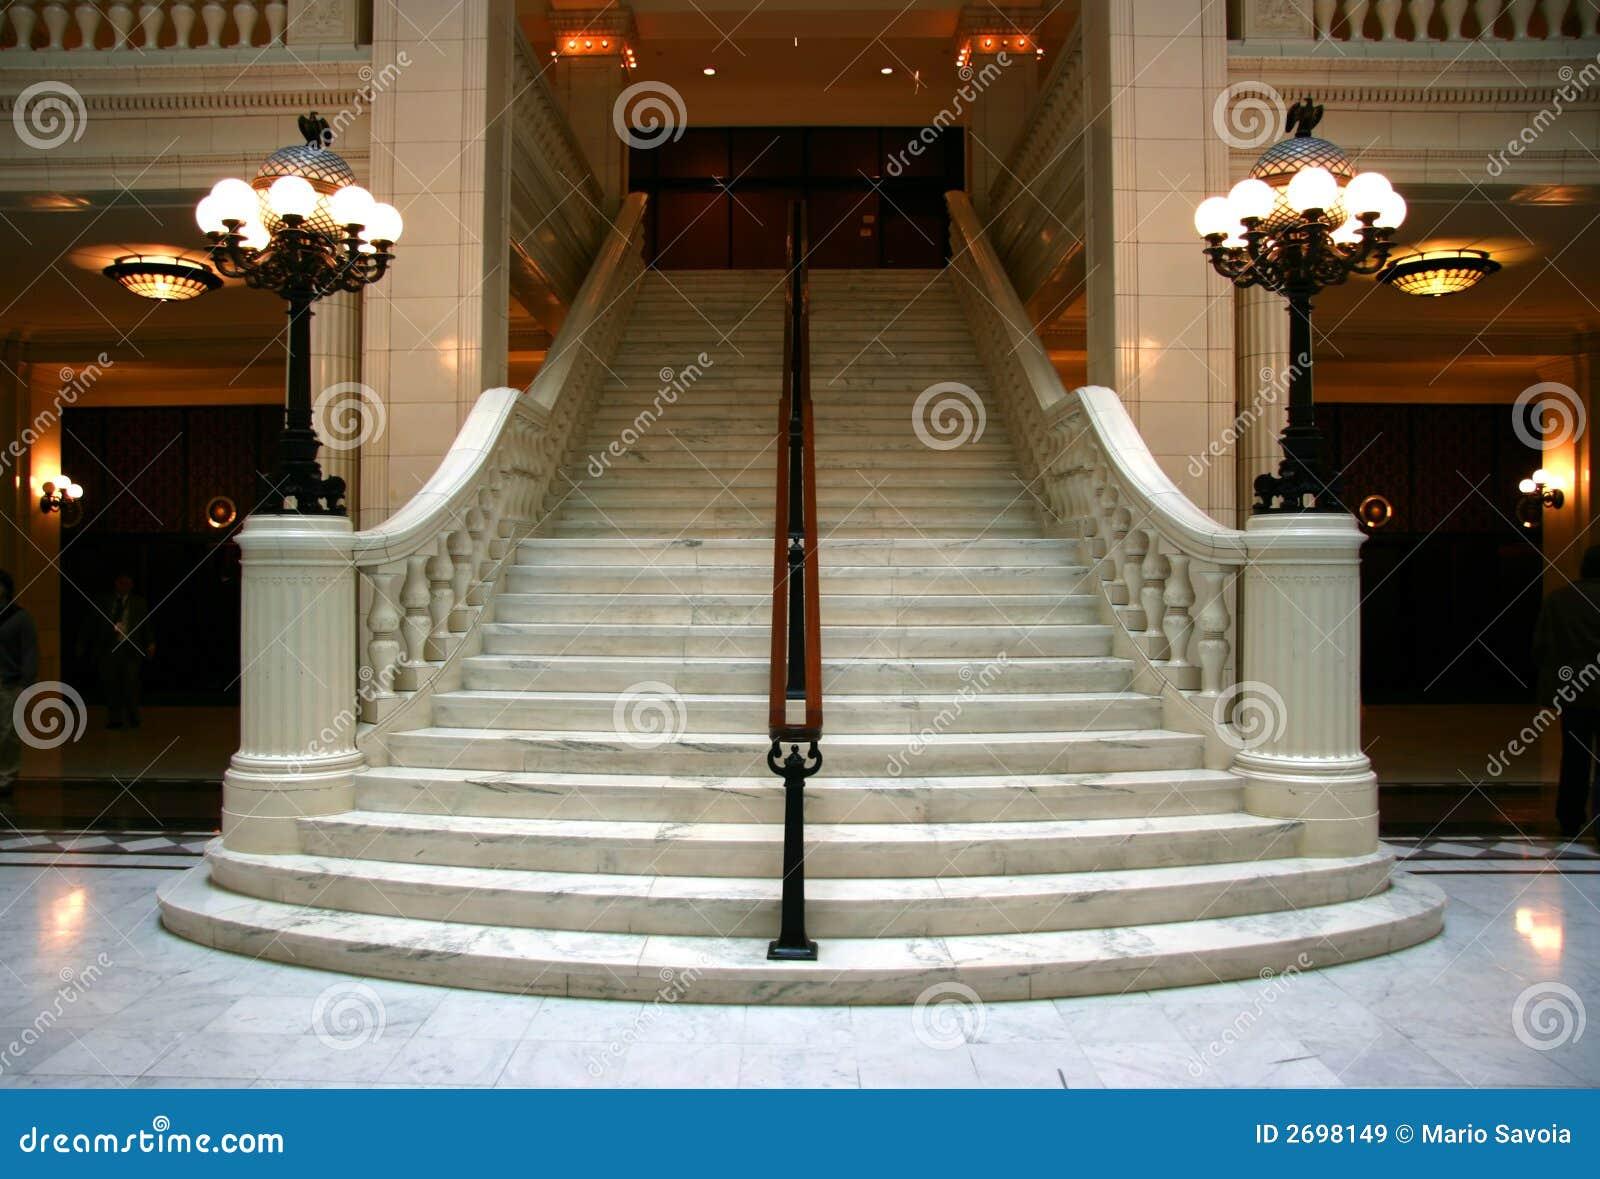 escalier de marbre image stock image du entr e division 2698149. Black Bedroom Furniture Sets. Home Design Ideas